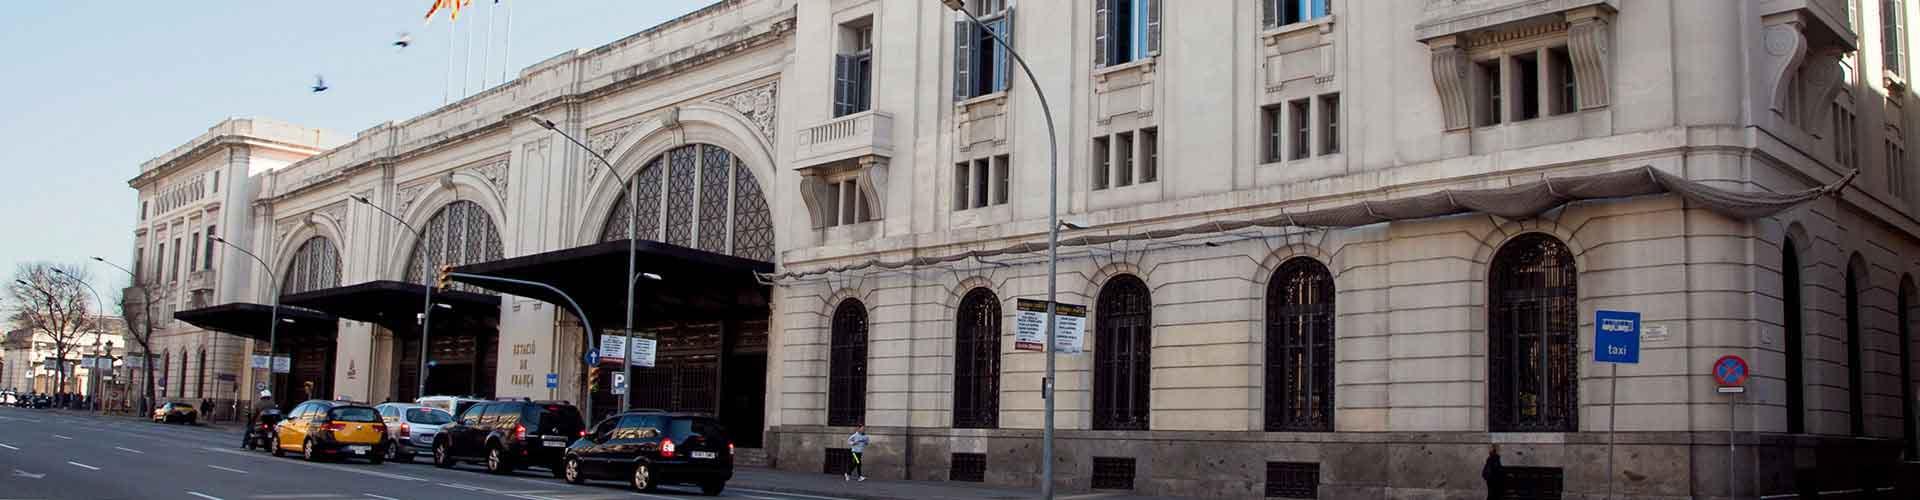 Barcelona - Hoteles baratos cerca a Estación de tren de França. Mapas de Barcelona, Fotos y Comentarios para cada hotel en Barcelona.